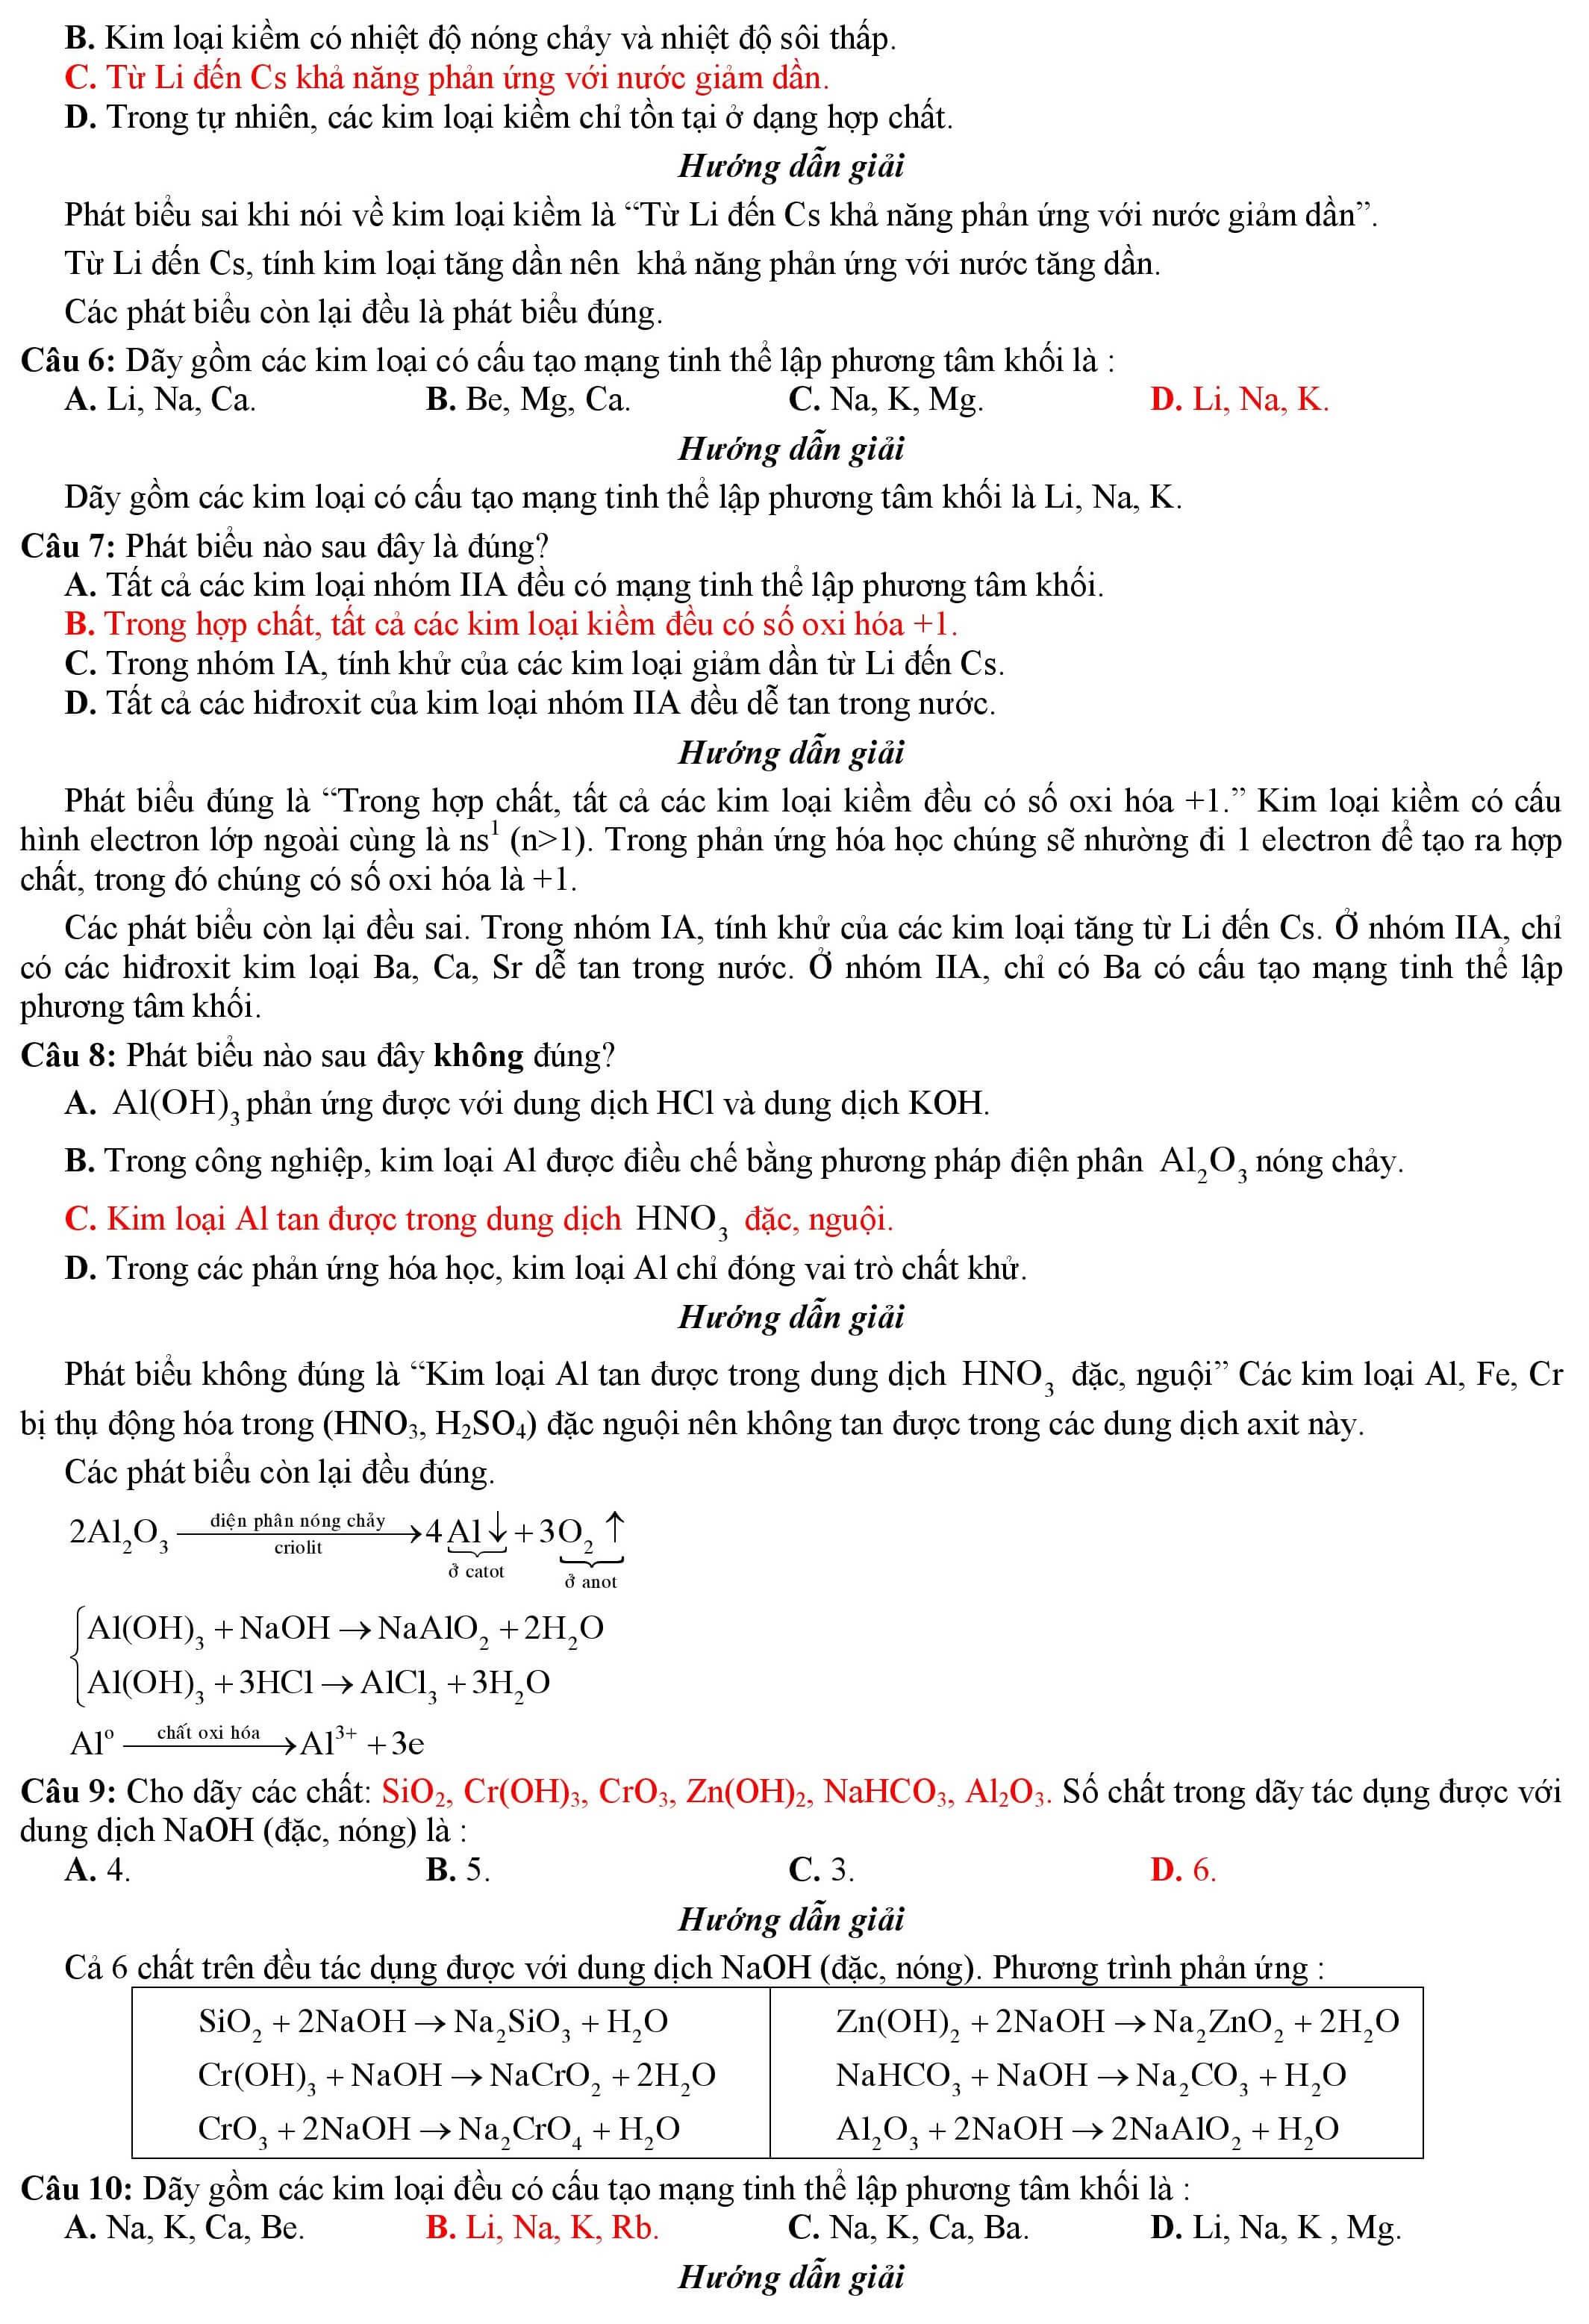 Kim loại kiềm và kim loại kiểm thổ (2).jpg